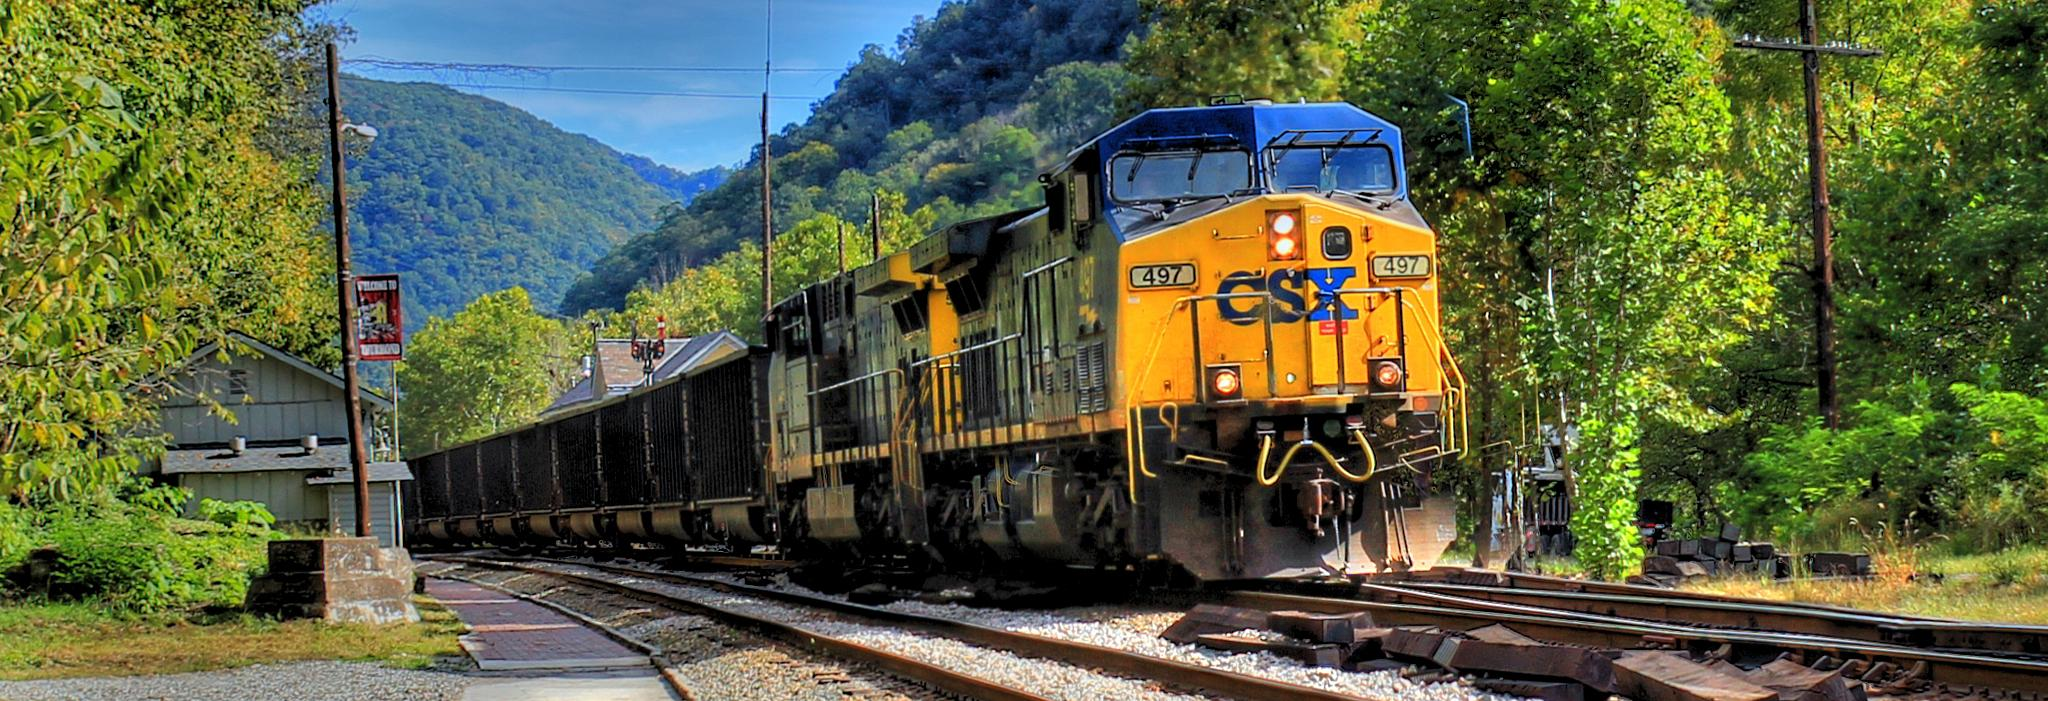 Train Train by BC_Visions